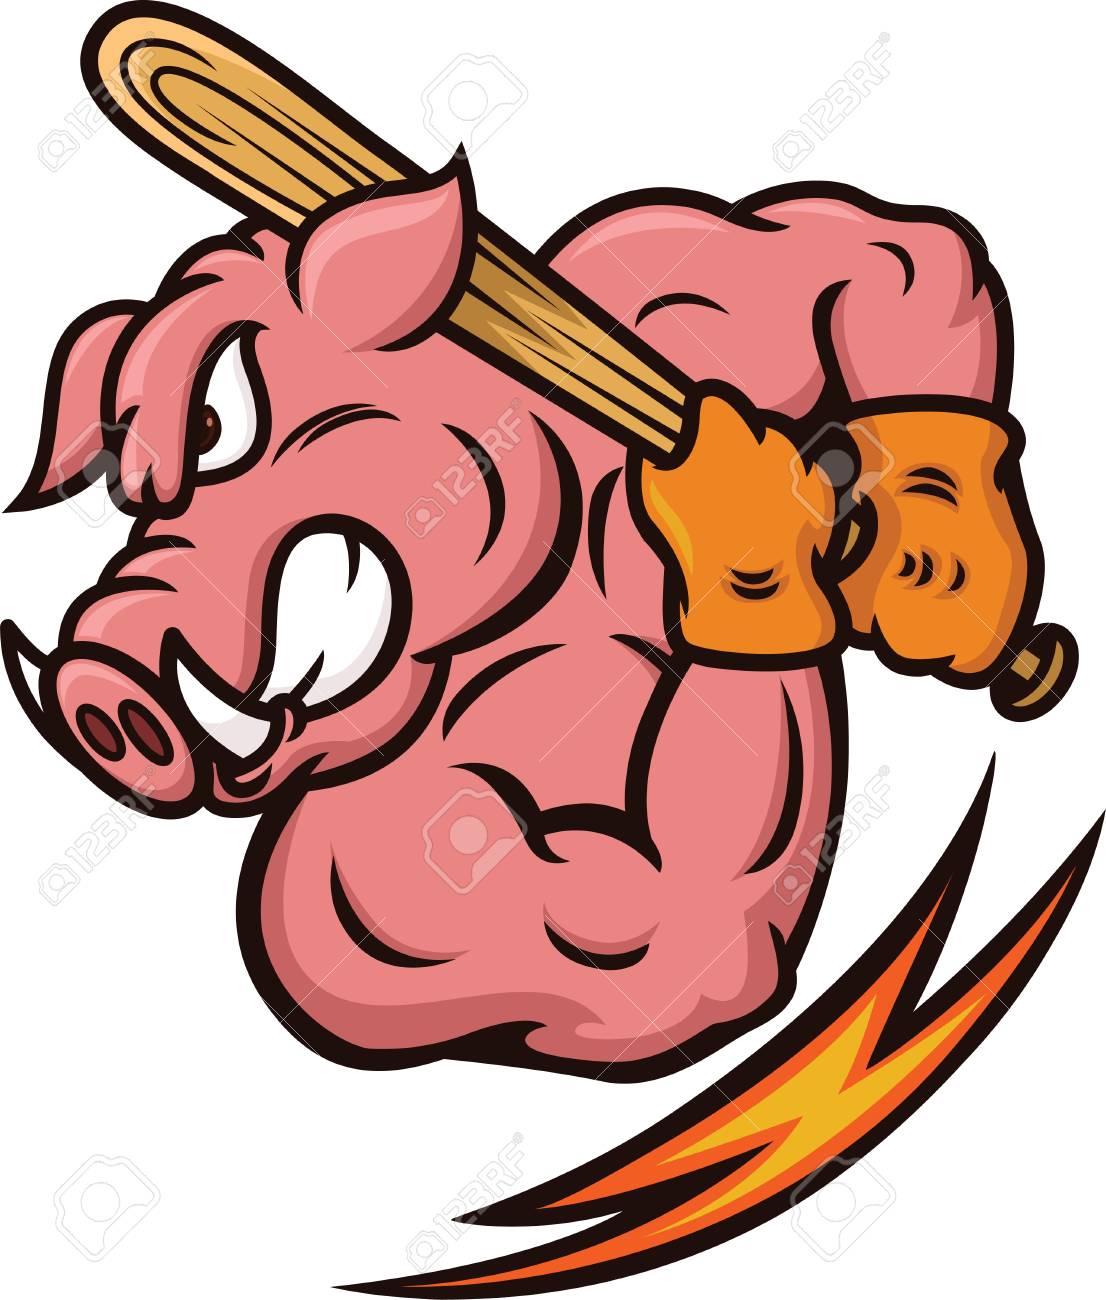 strong wild boar baseball player with baseball bat cartoon rh 123rf com Baseball Bat Decal Baseball Bat Logo Designs